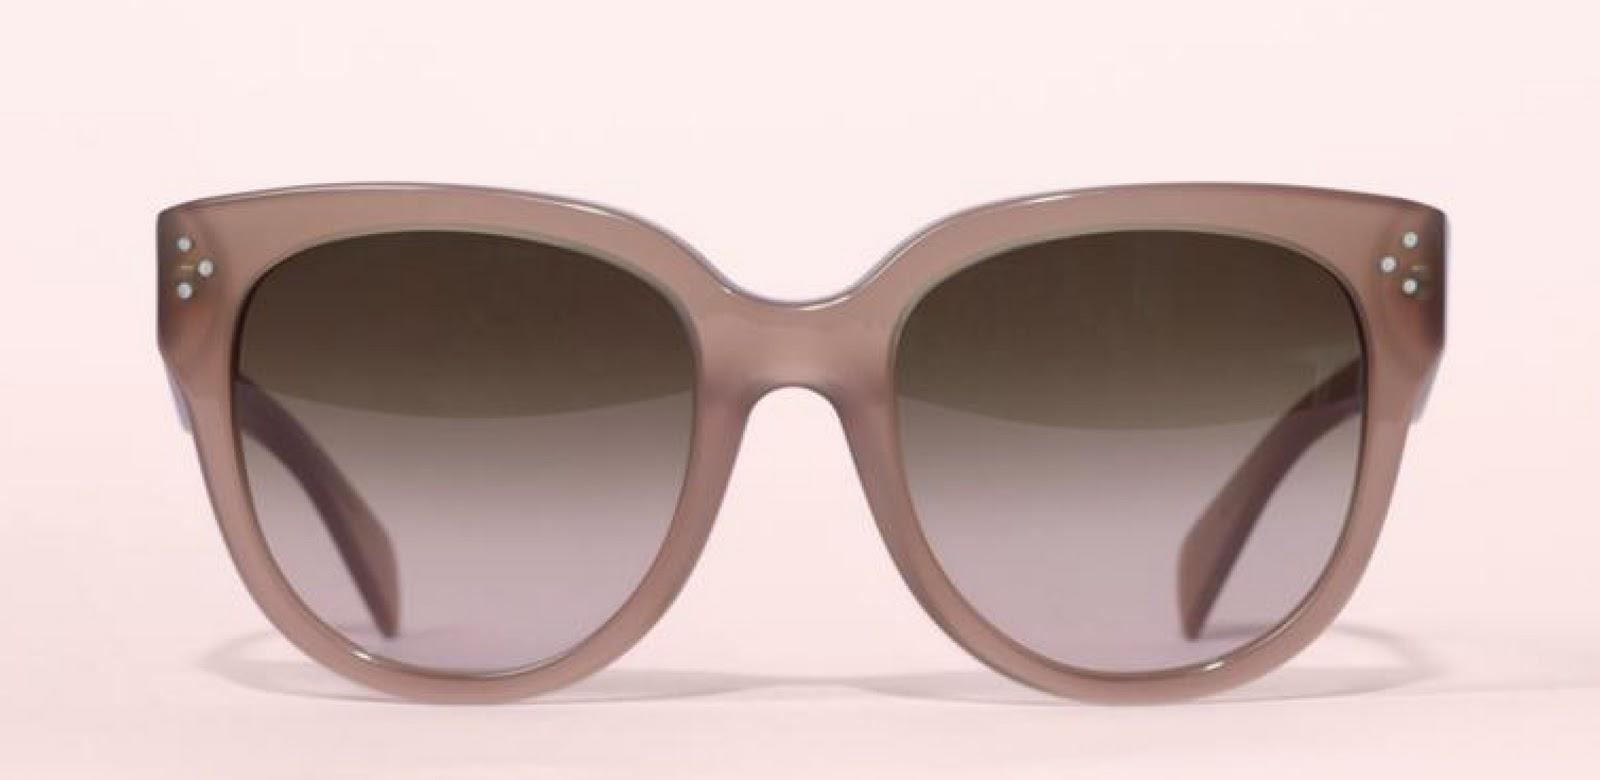 13df2a3141ed Celine Sunglasses Audrey Small